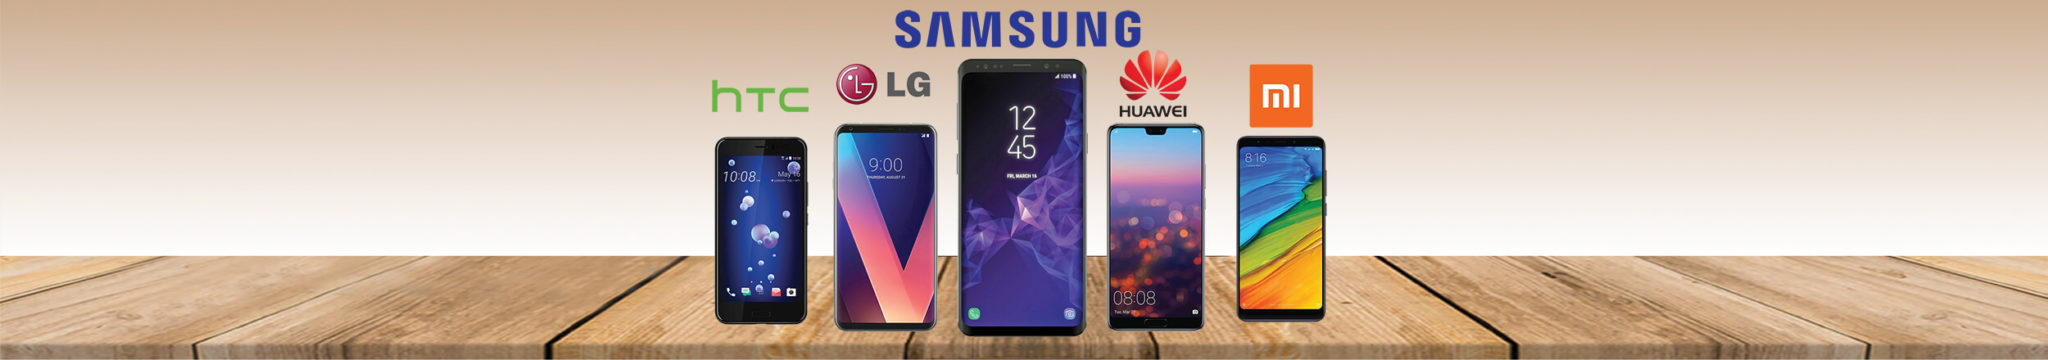 Servis Naprave - APPLE / SAMSUNG / HUAWEI / LG / HTC / XIAOMI